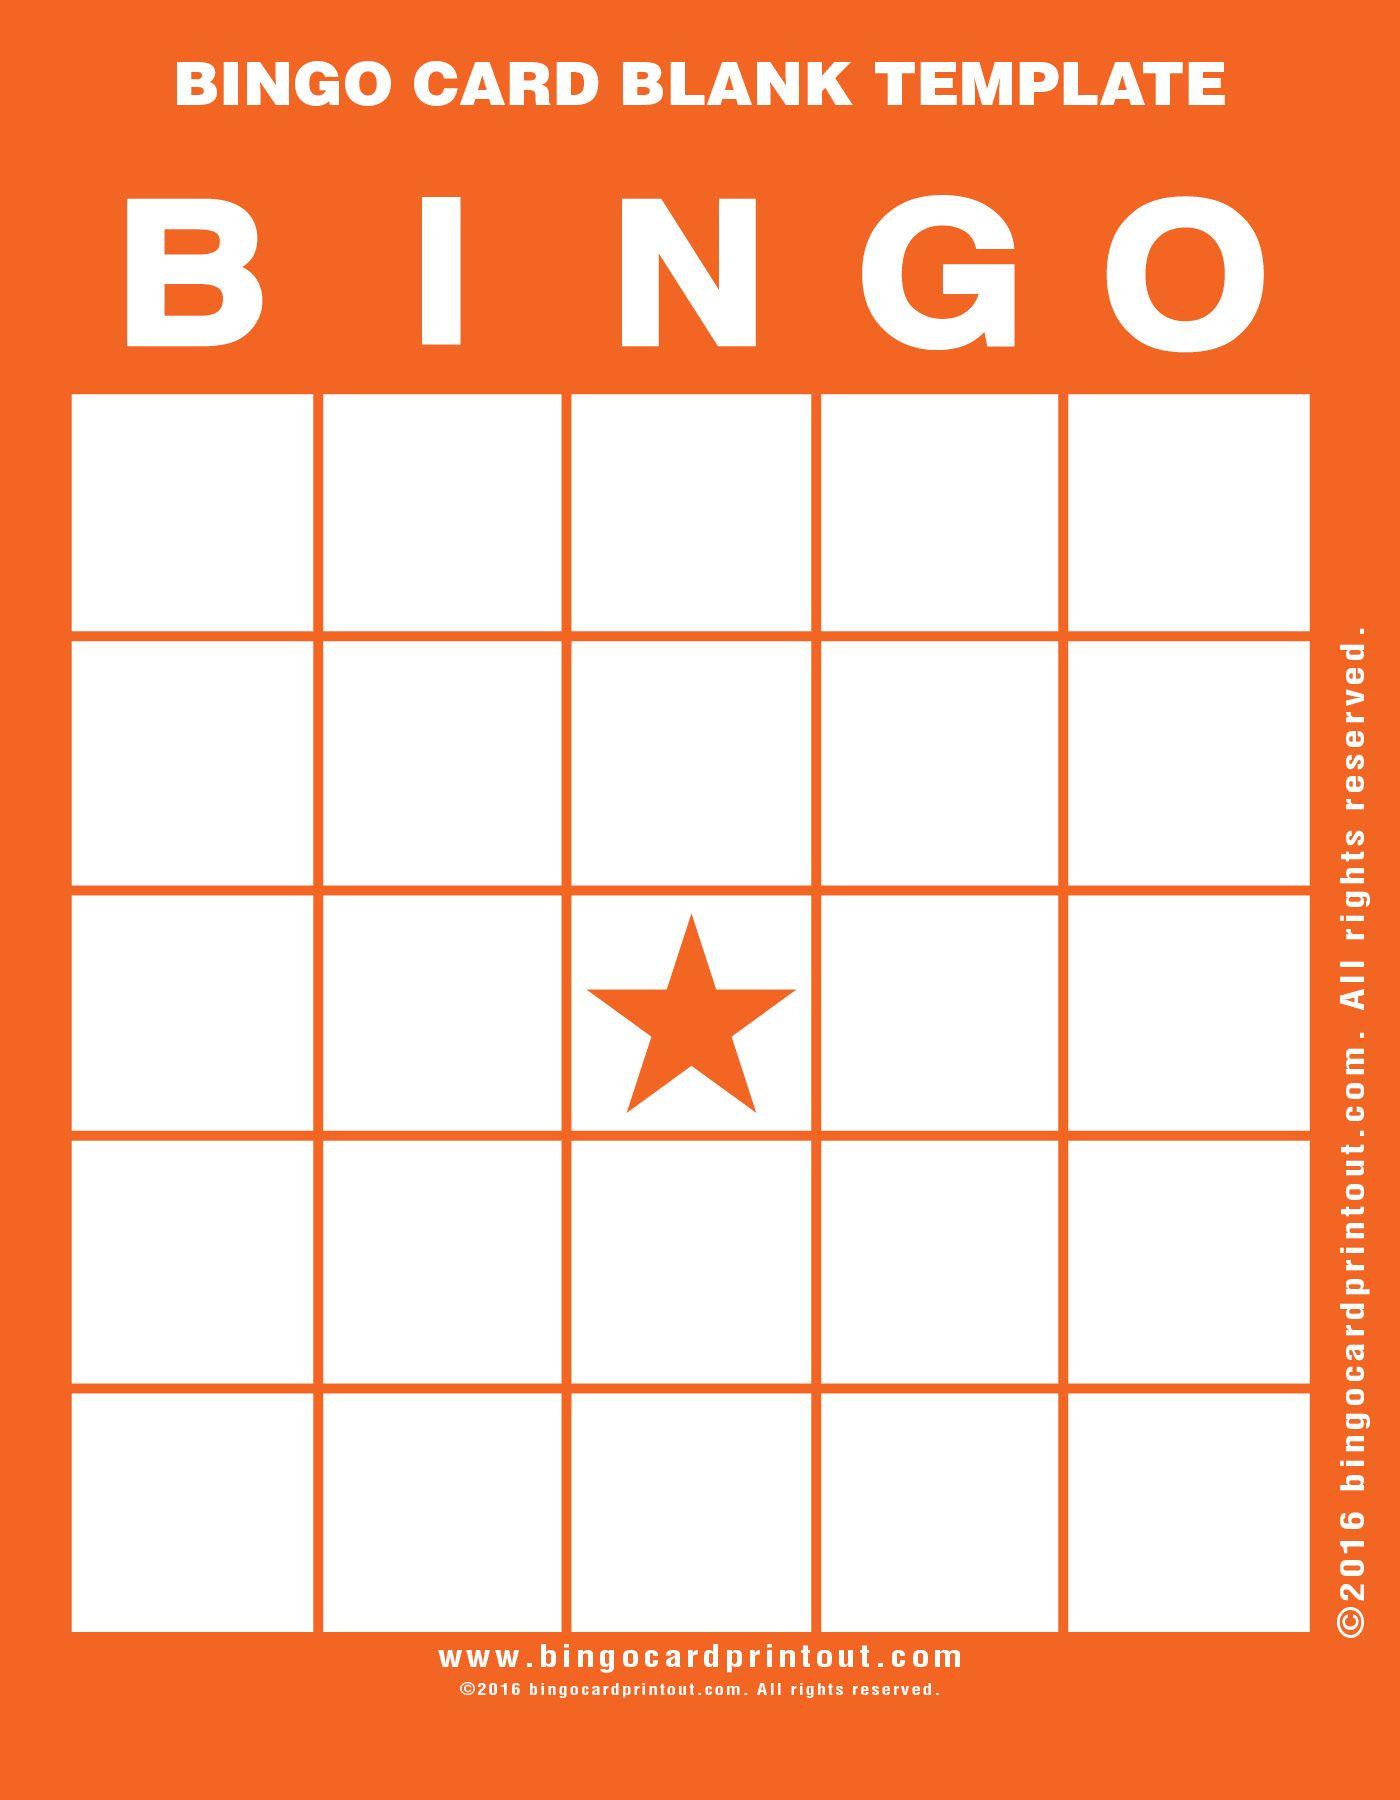 The breathtaking 009 Bingo Card Blank Template Stirring